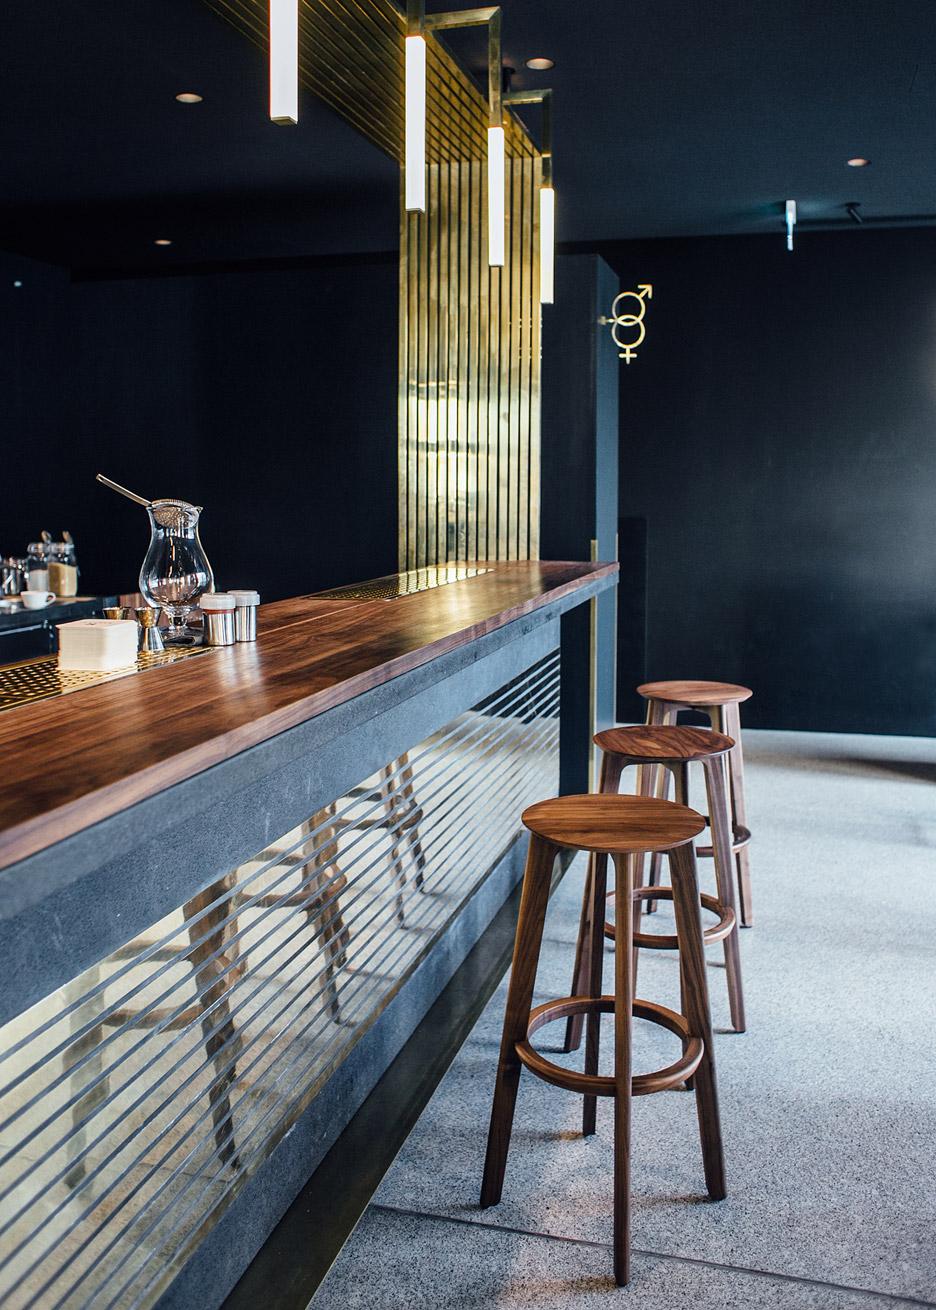 architecture_brass_vein_modern_residence_design_studia_interiors_osnovadesign_osnova_poltava_04